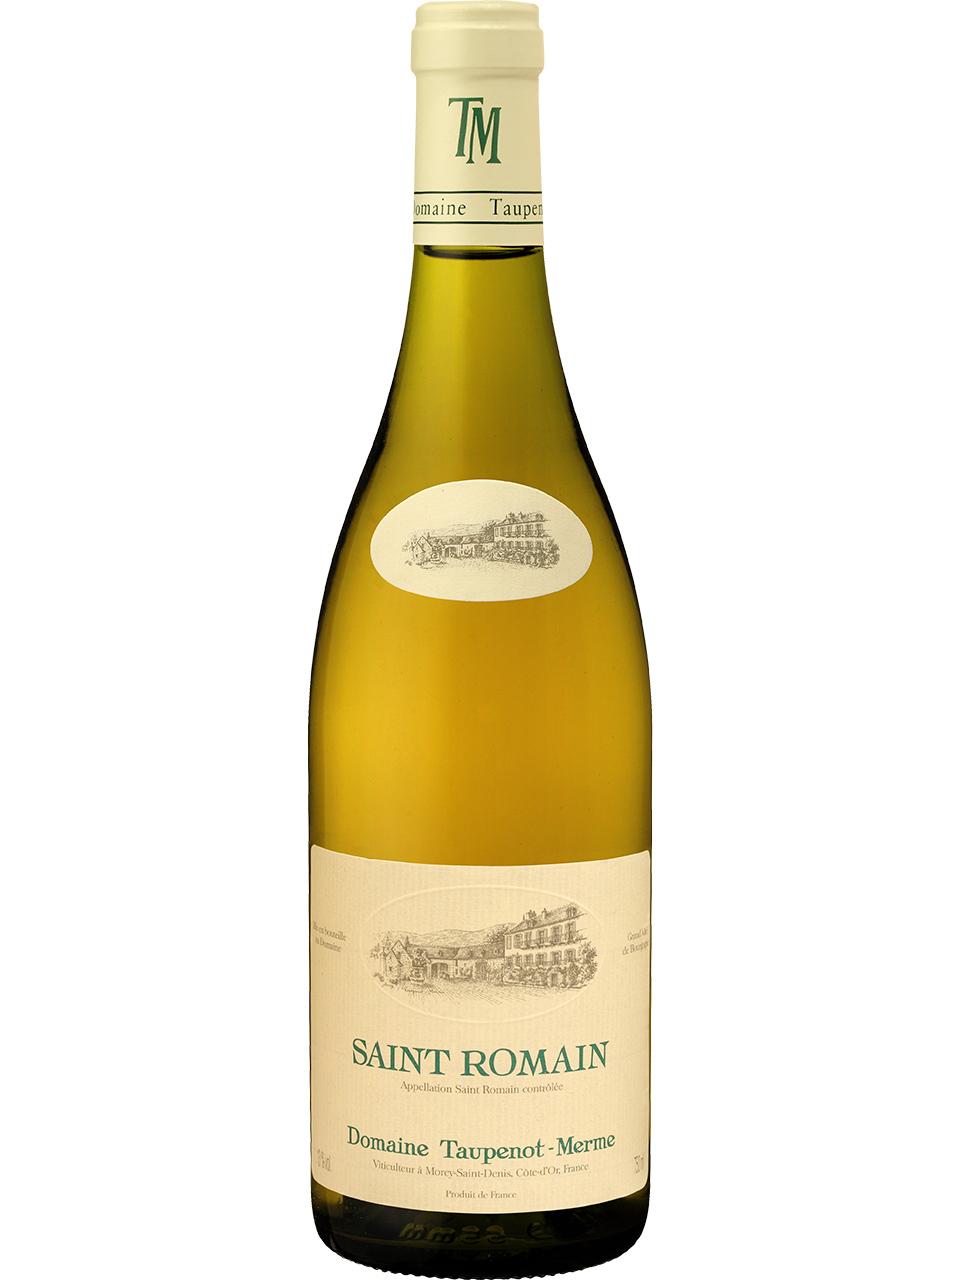 Taupenot Merme Saint Romain White 2017